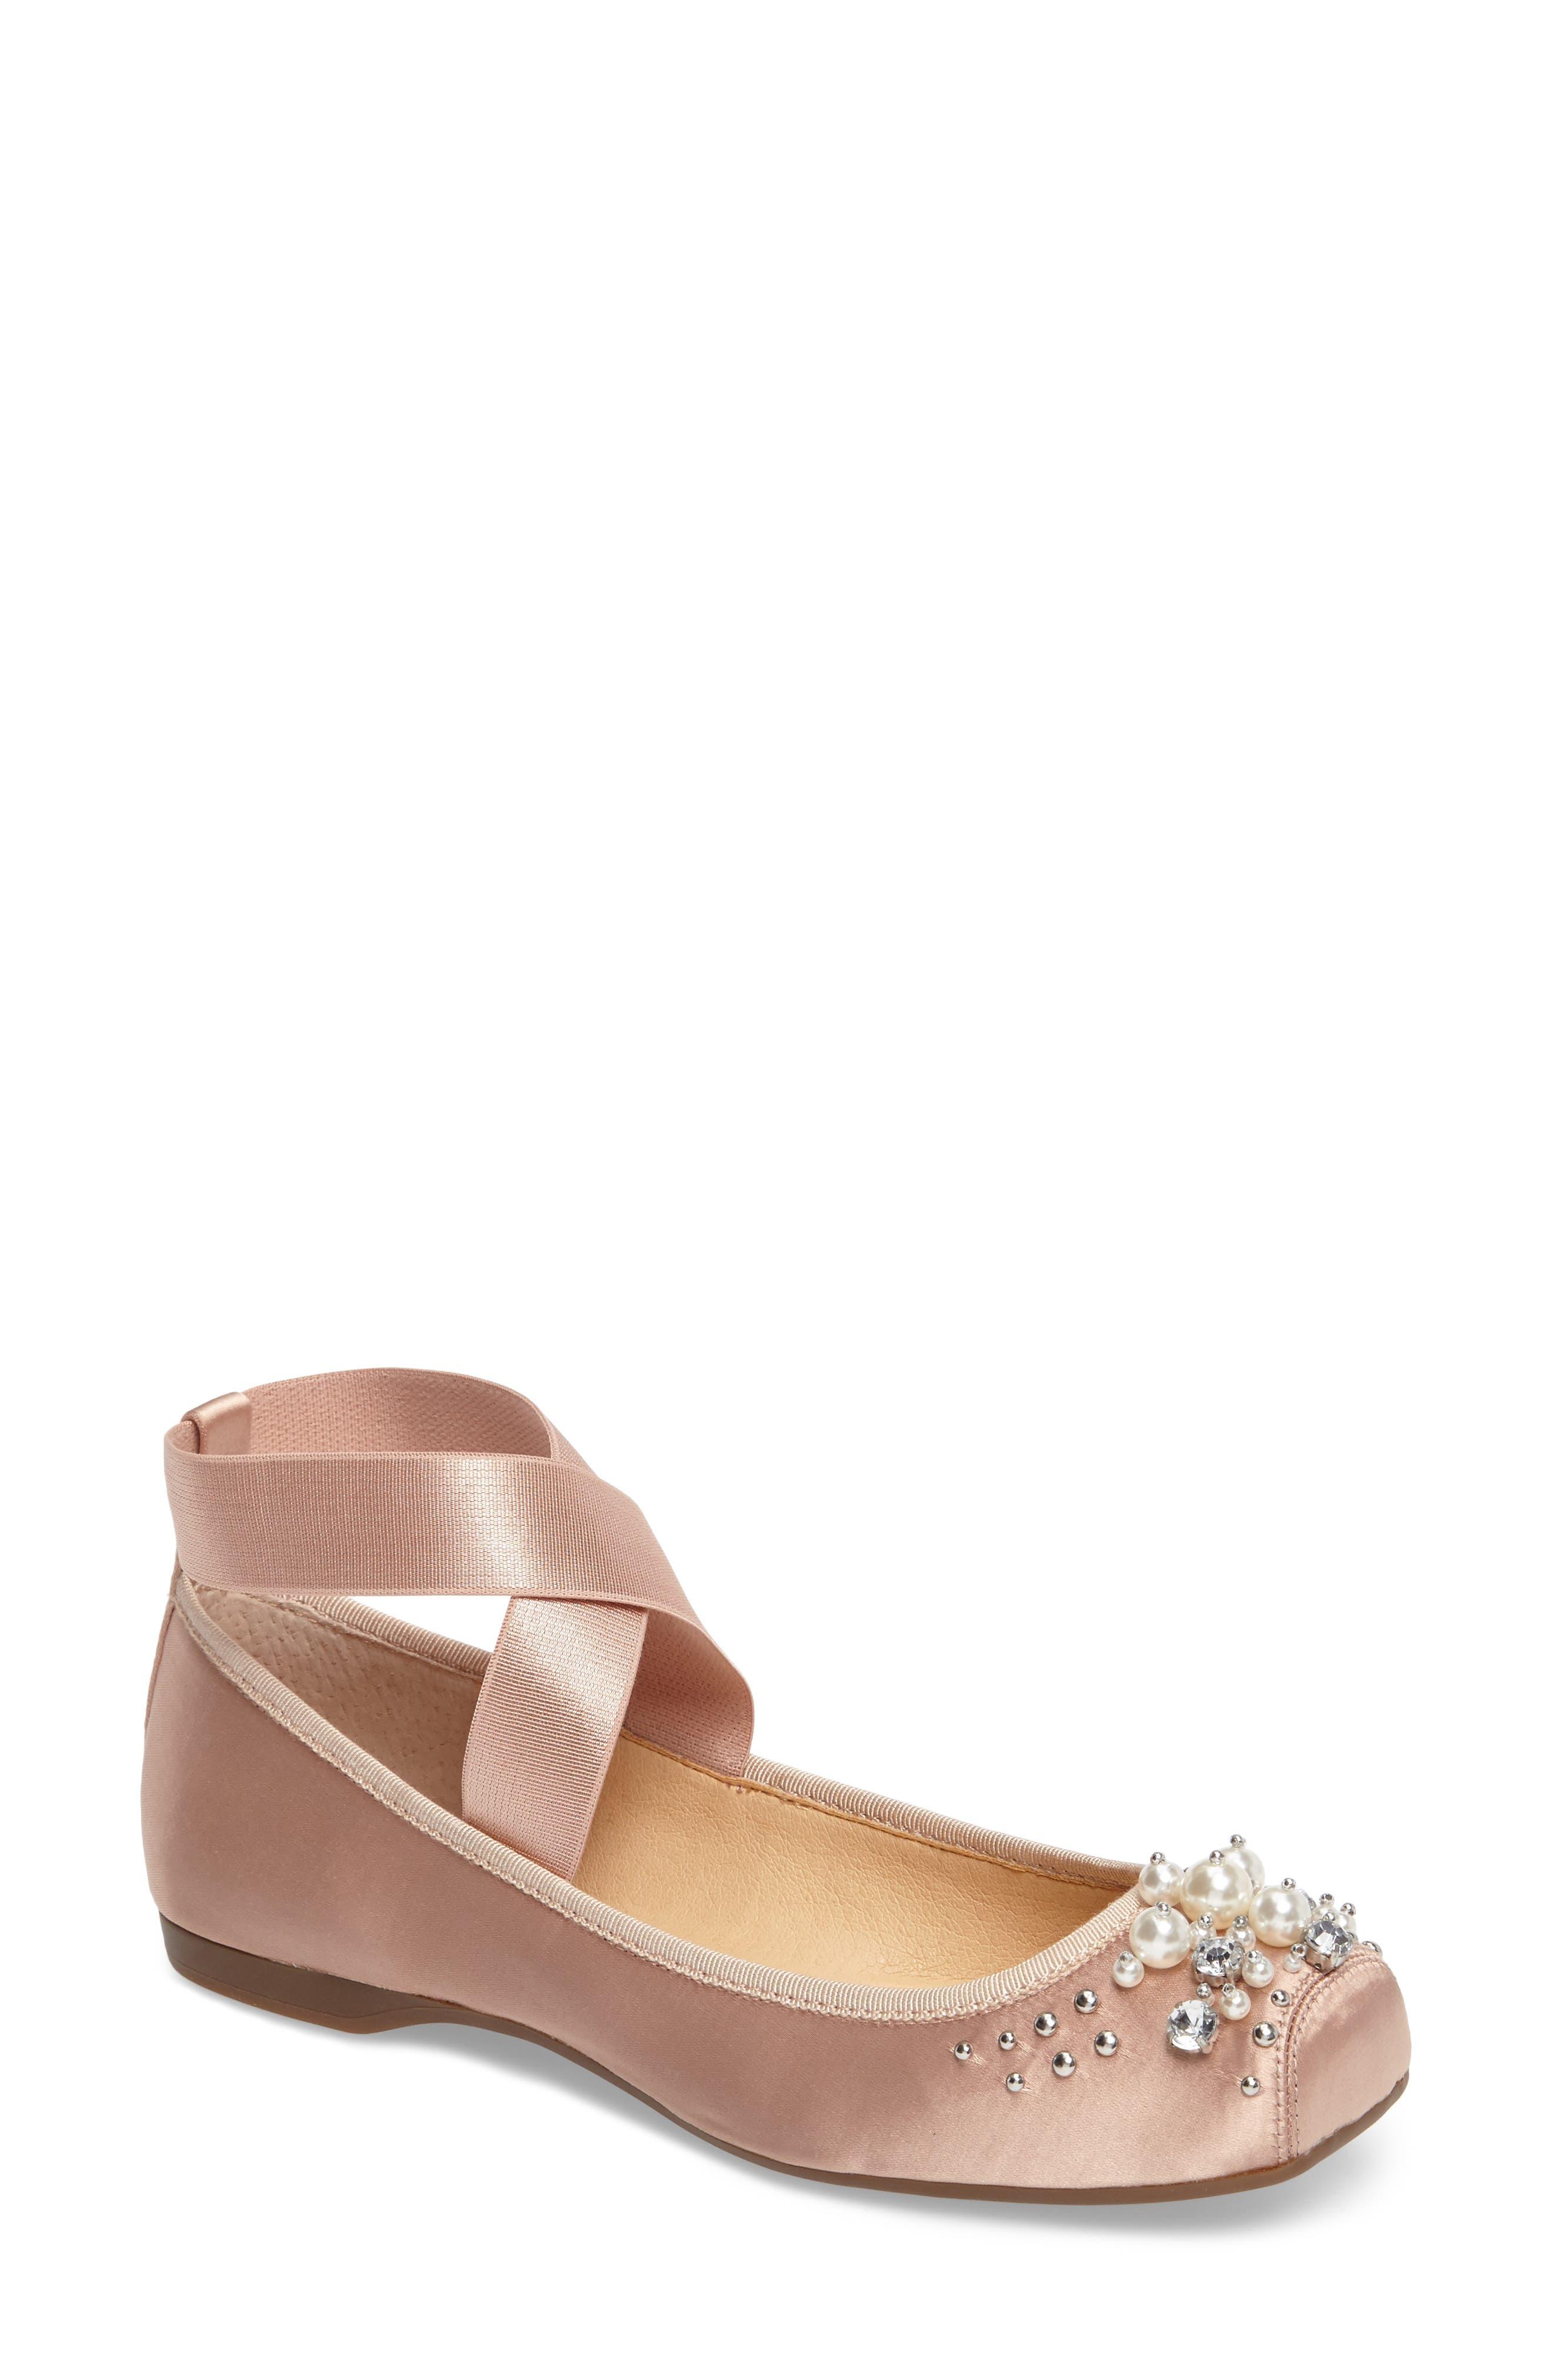 Jessica Simpson Mineah Ballet Flat (Women)